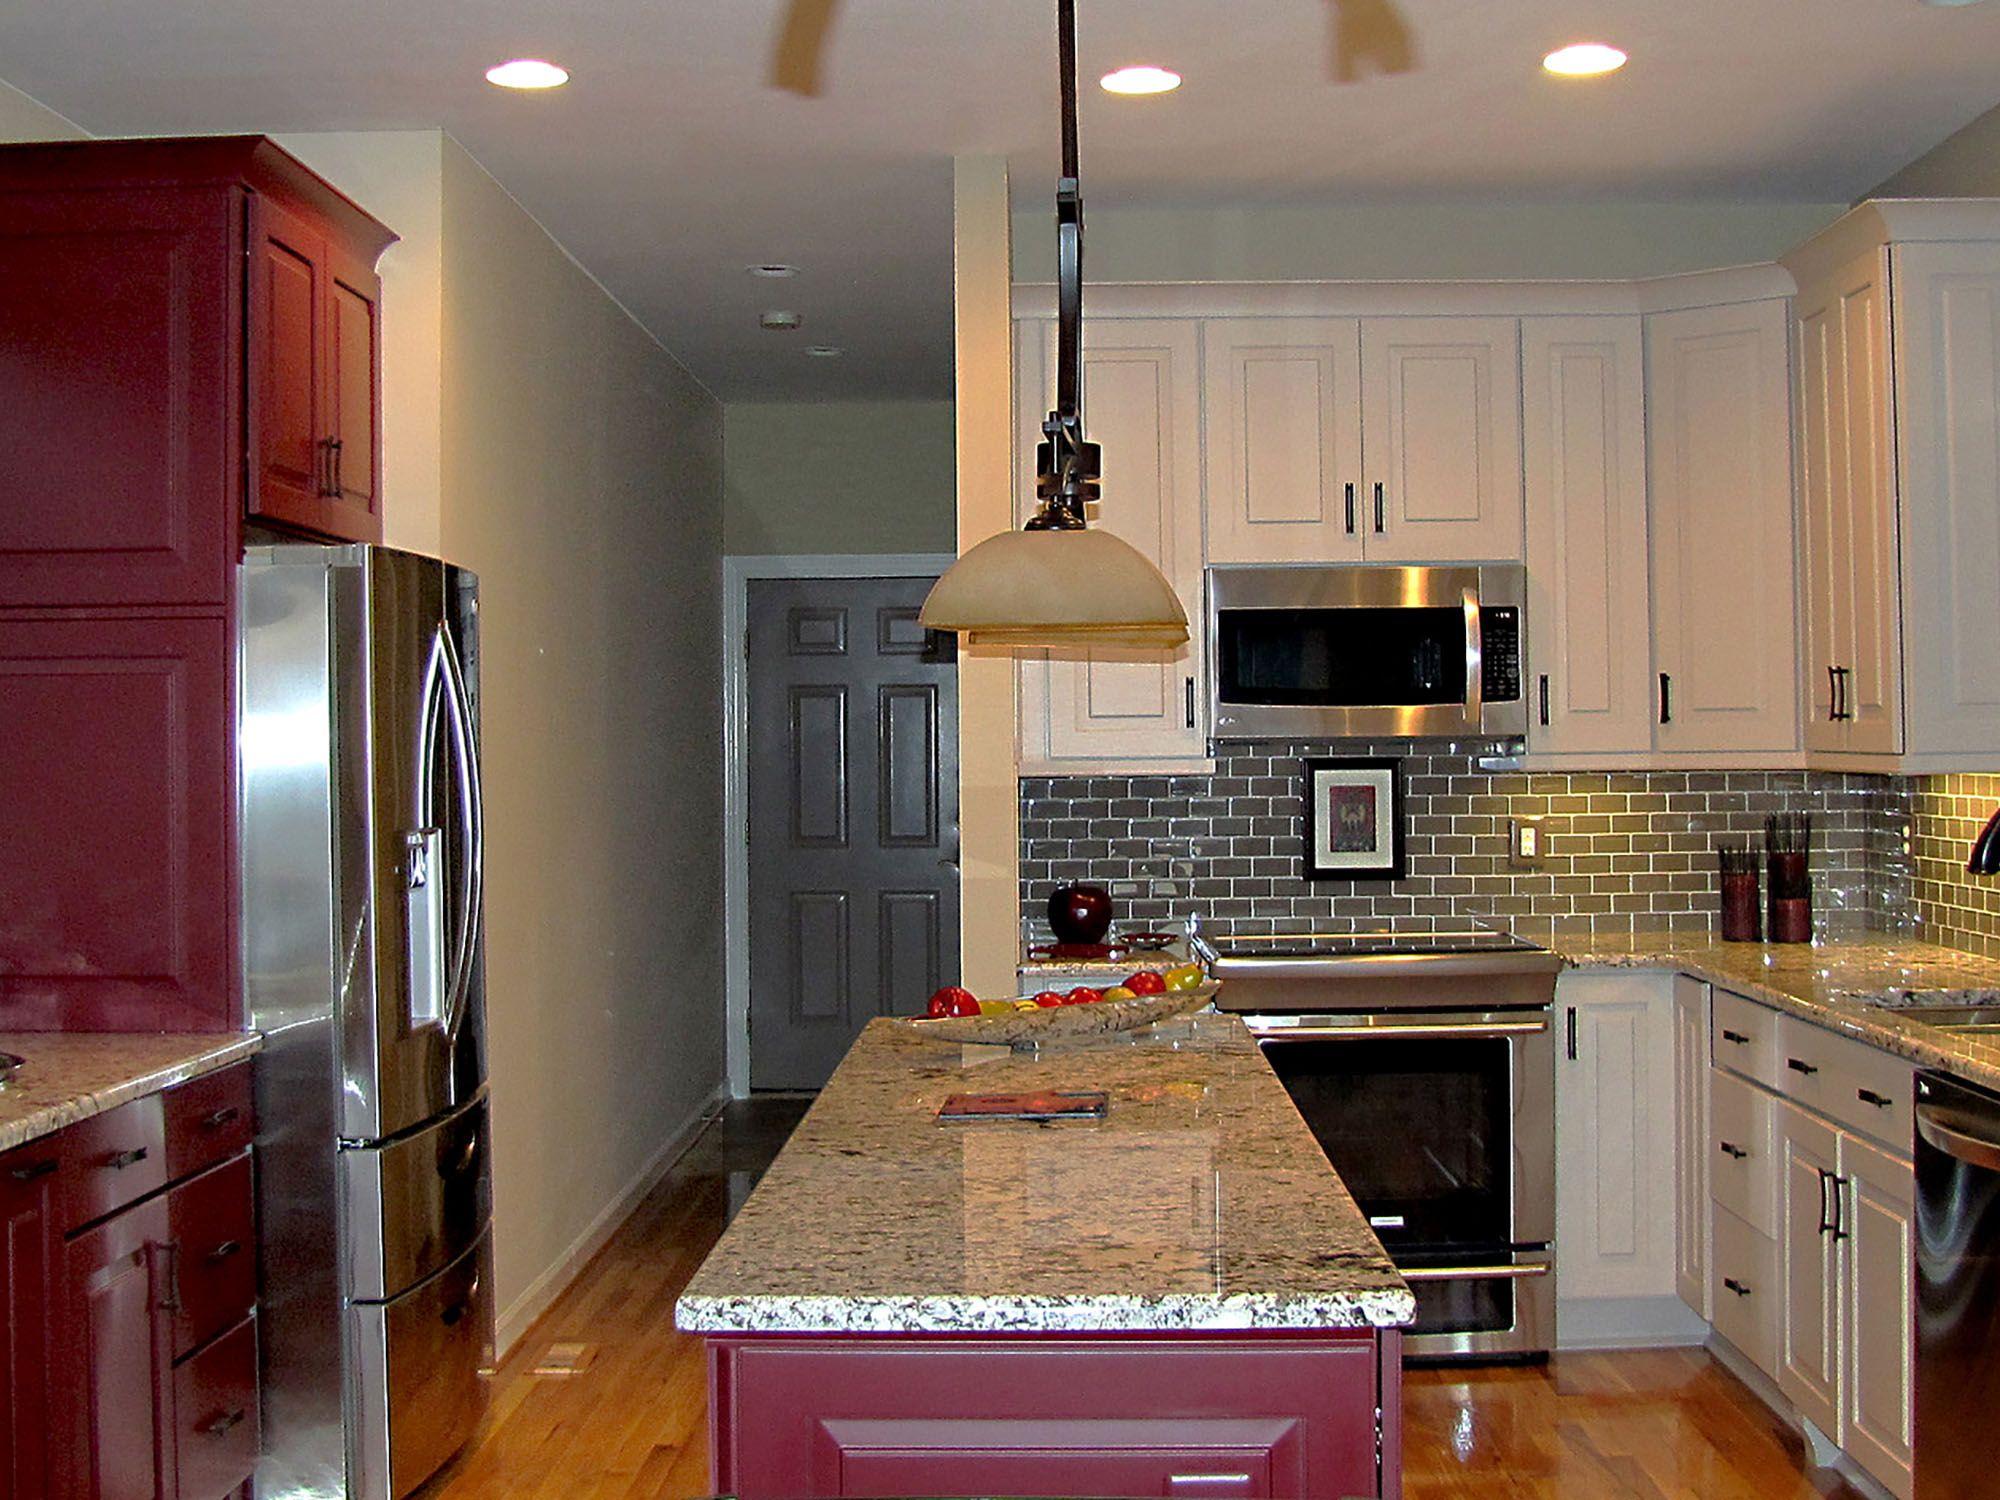 Salem South Carolina kitchen renovation features ...